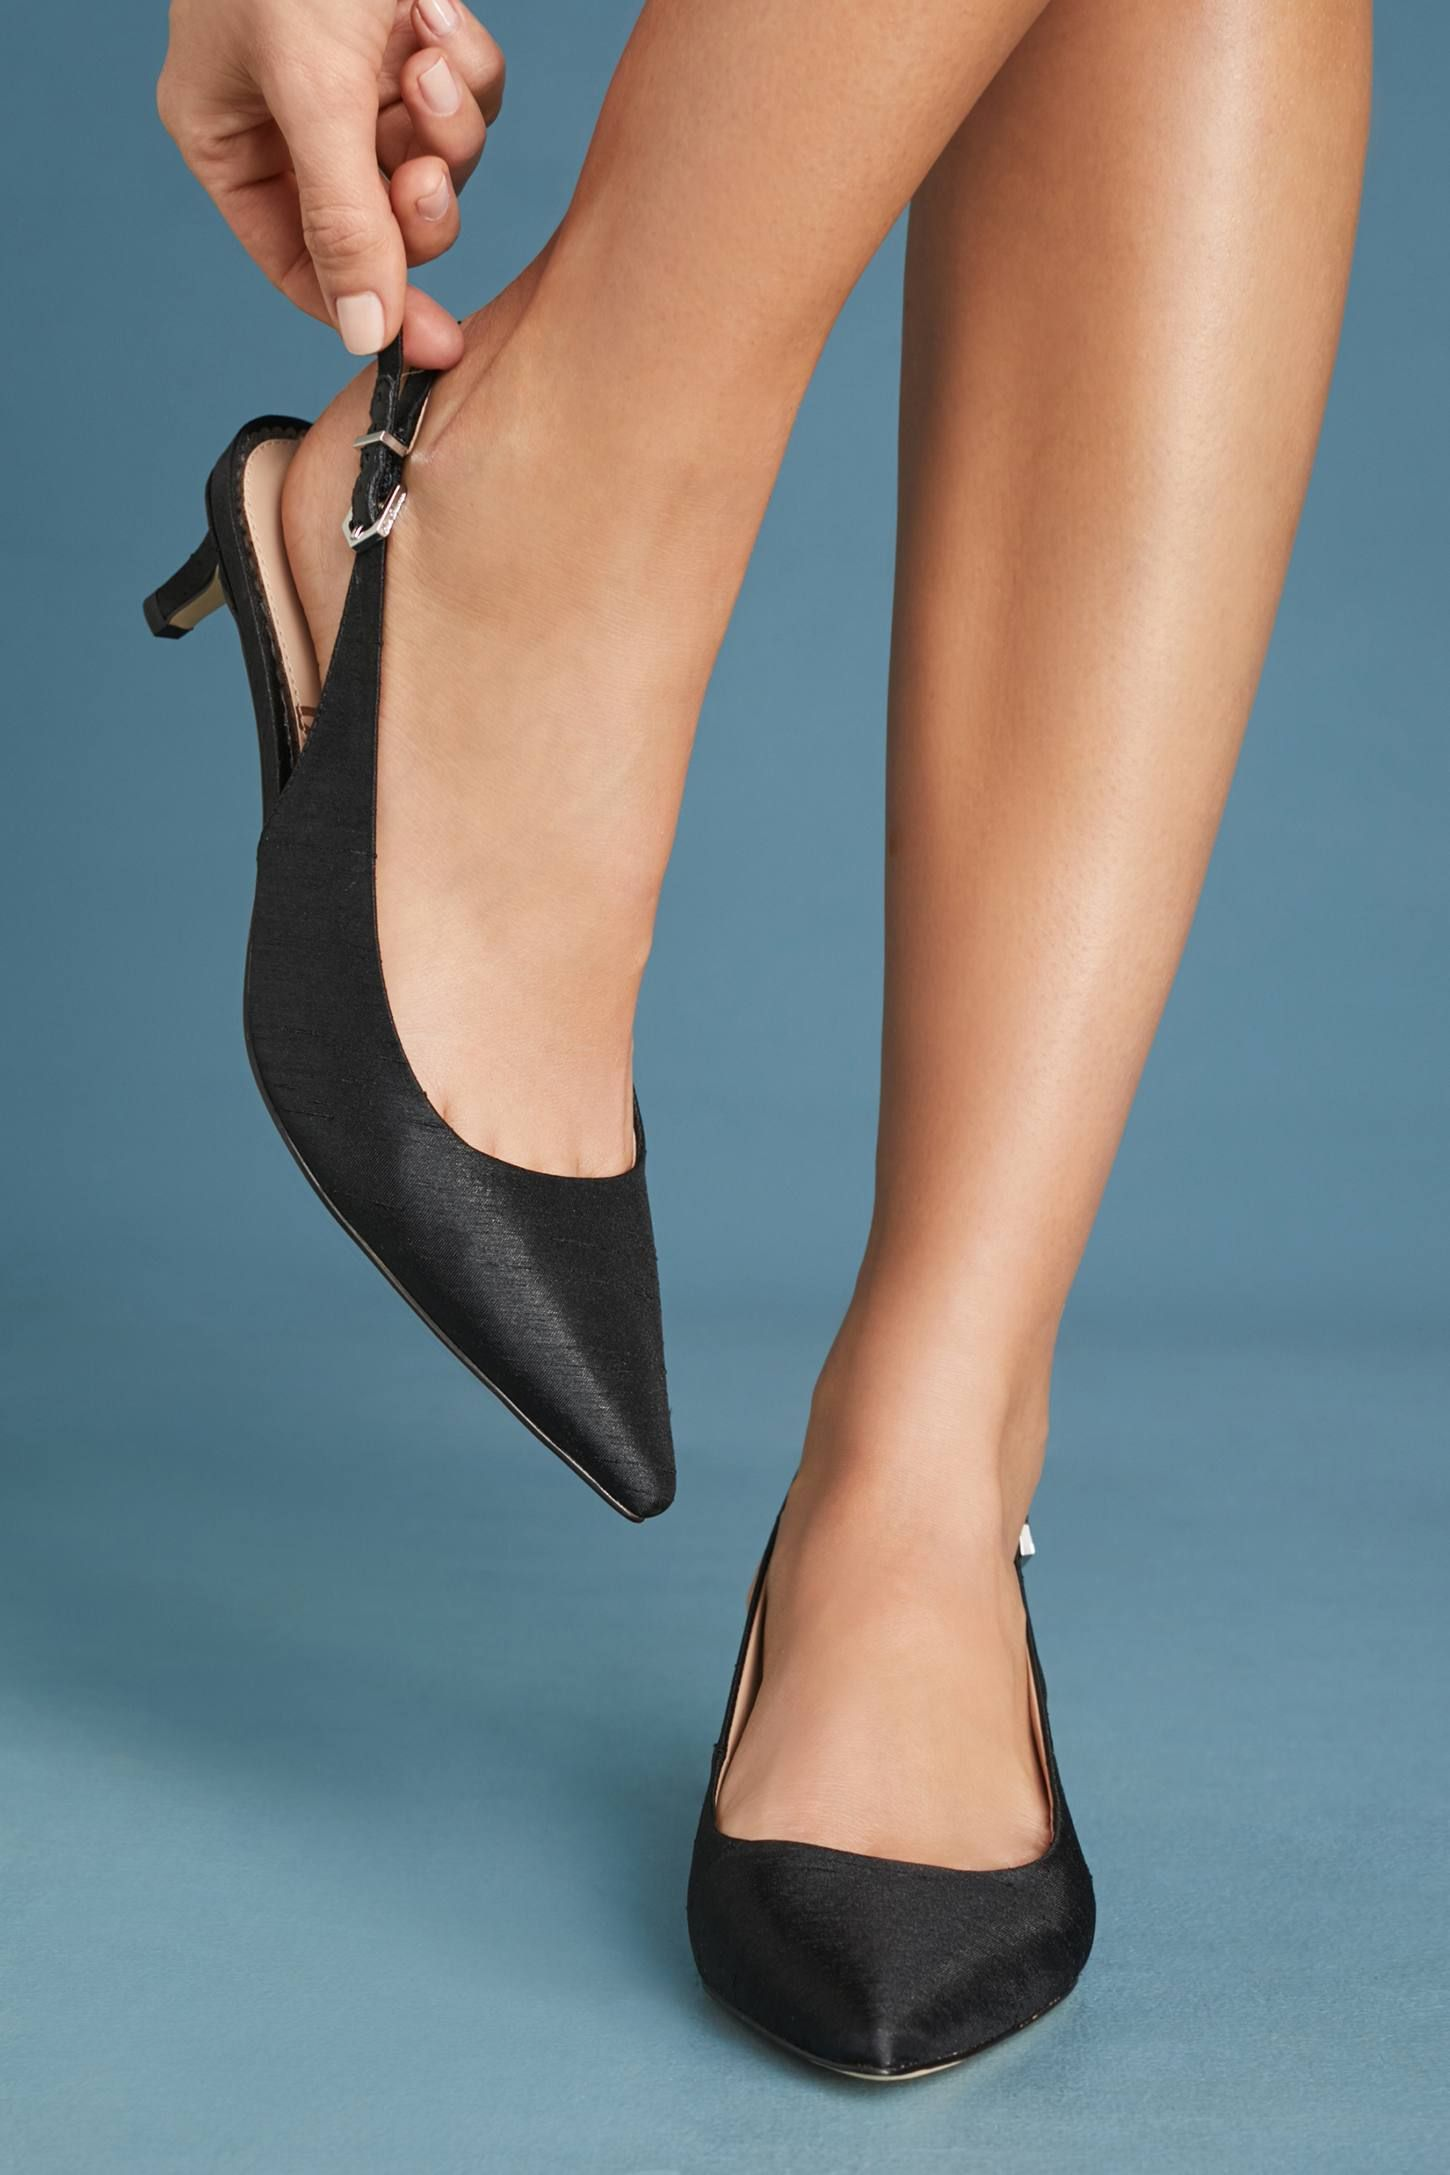 Sam Edelman Ludlow Kitten Heels Heels Kitten Heel Wedding Shoes Fashion High Heels